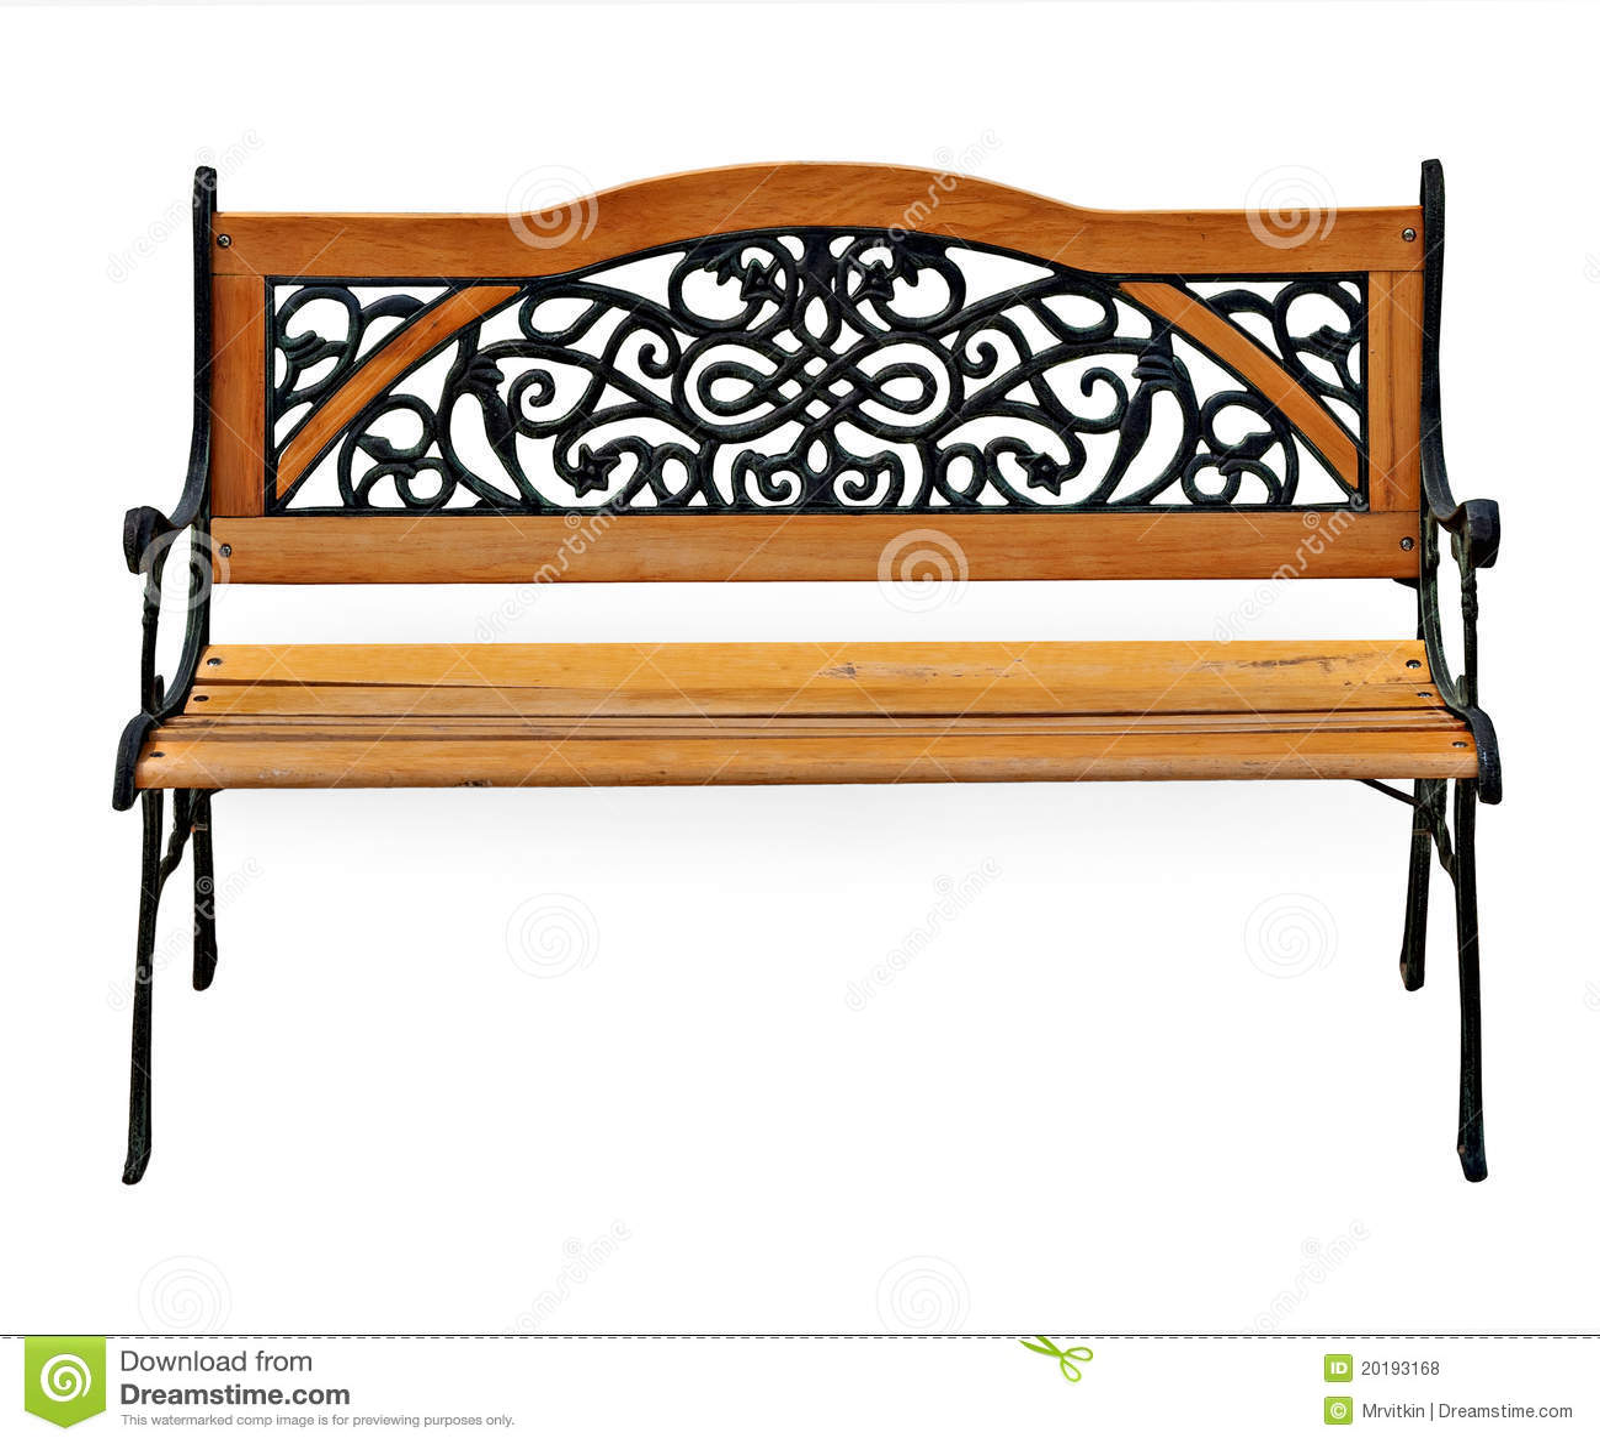 banco de jardim em ferro fundido : banco de jardim em ferro fundido:Fotos de Stock Royalty Free: Banco à moda do ferro fundido do jardim